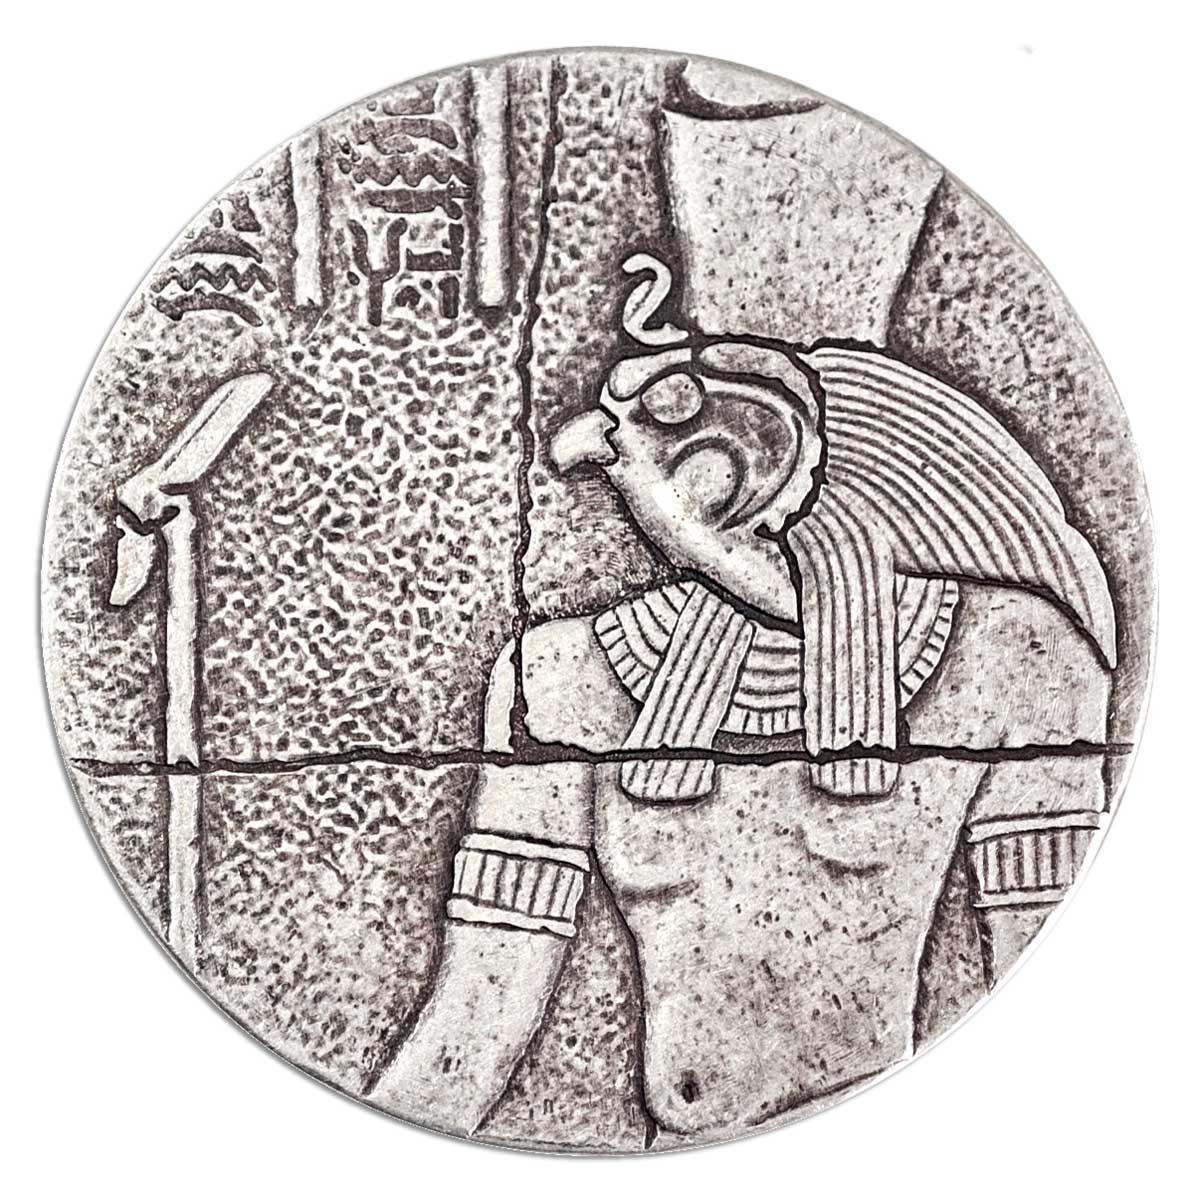 EGYPTIAN RELICS HORUS 2016 CHAD 2OZ SILVER